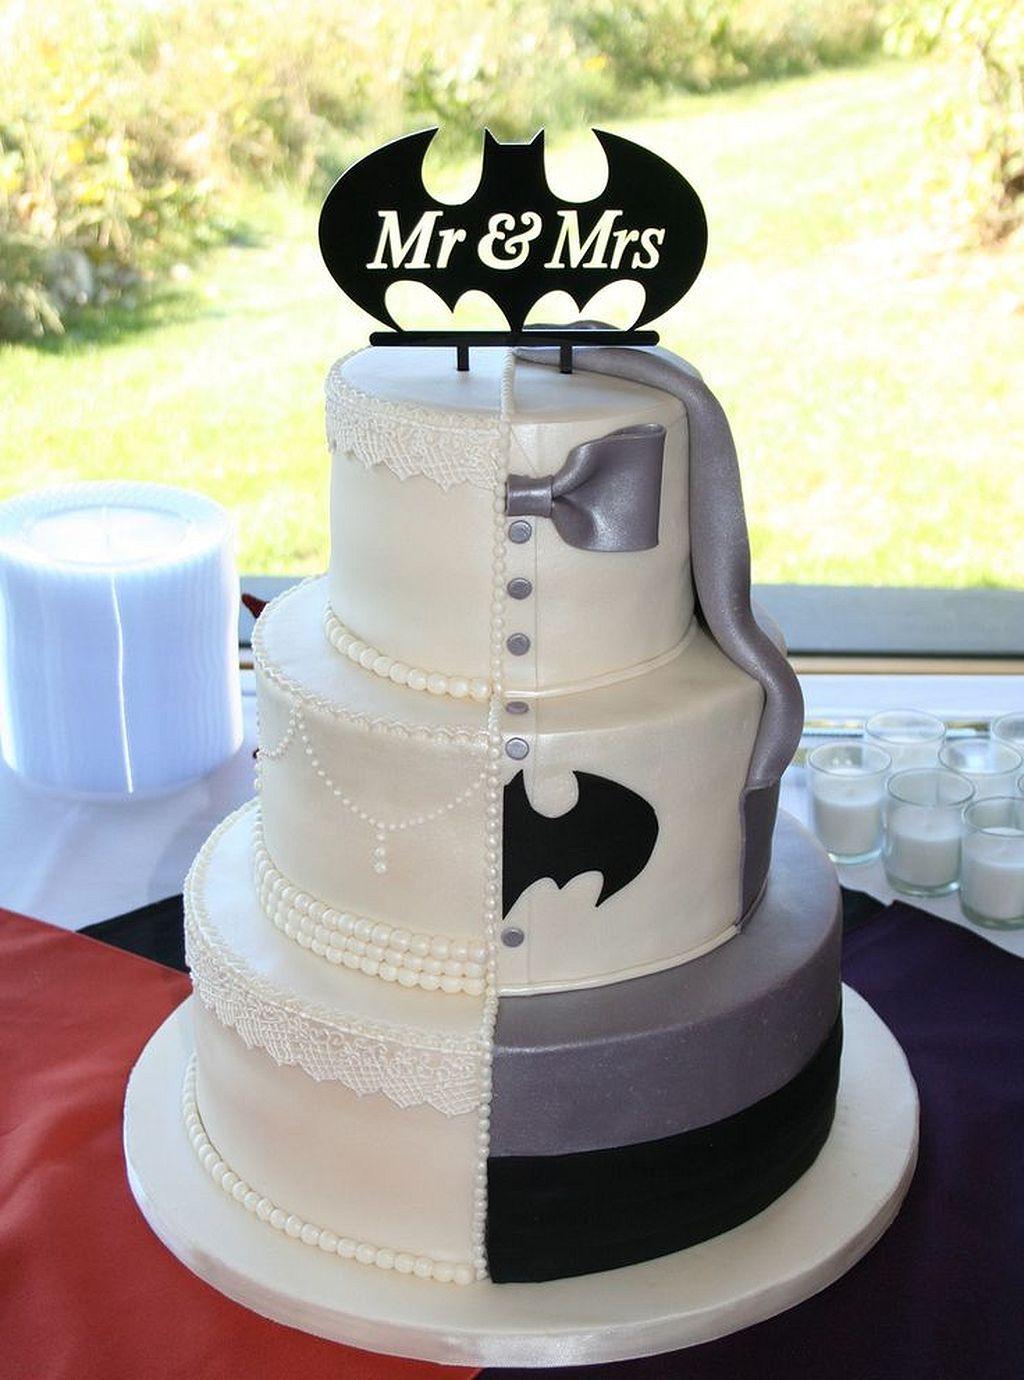 Batman Wedding Cake.Superhero Themed Wedding Ideas 190 1 000 Wedding Cakes You Ll Fall